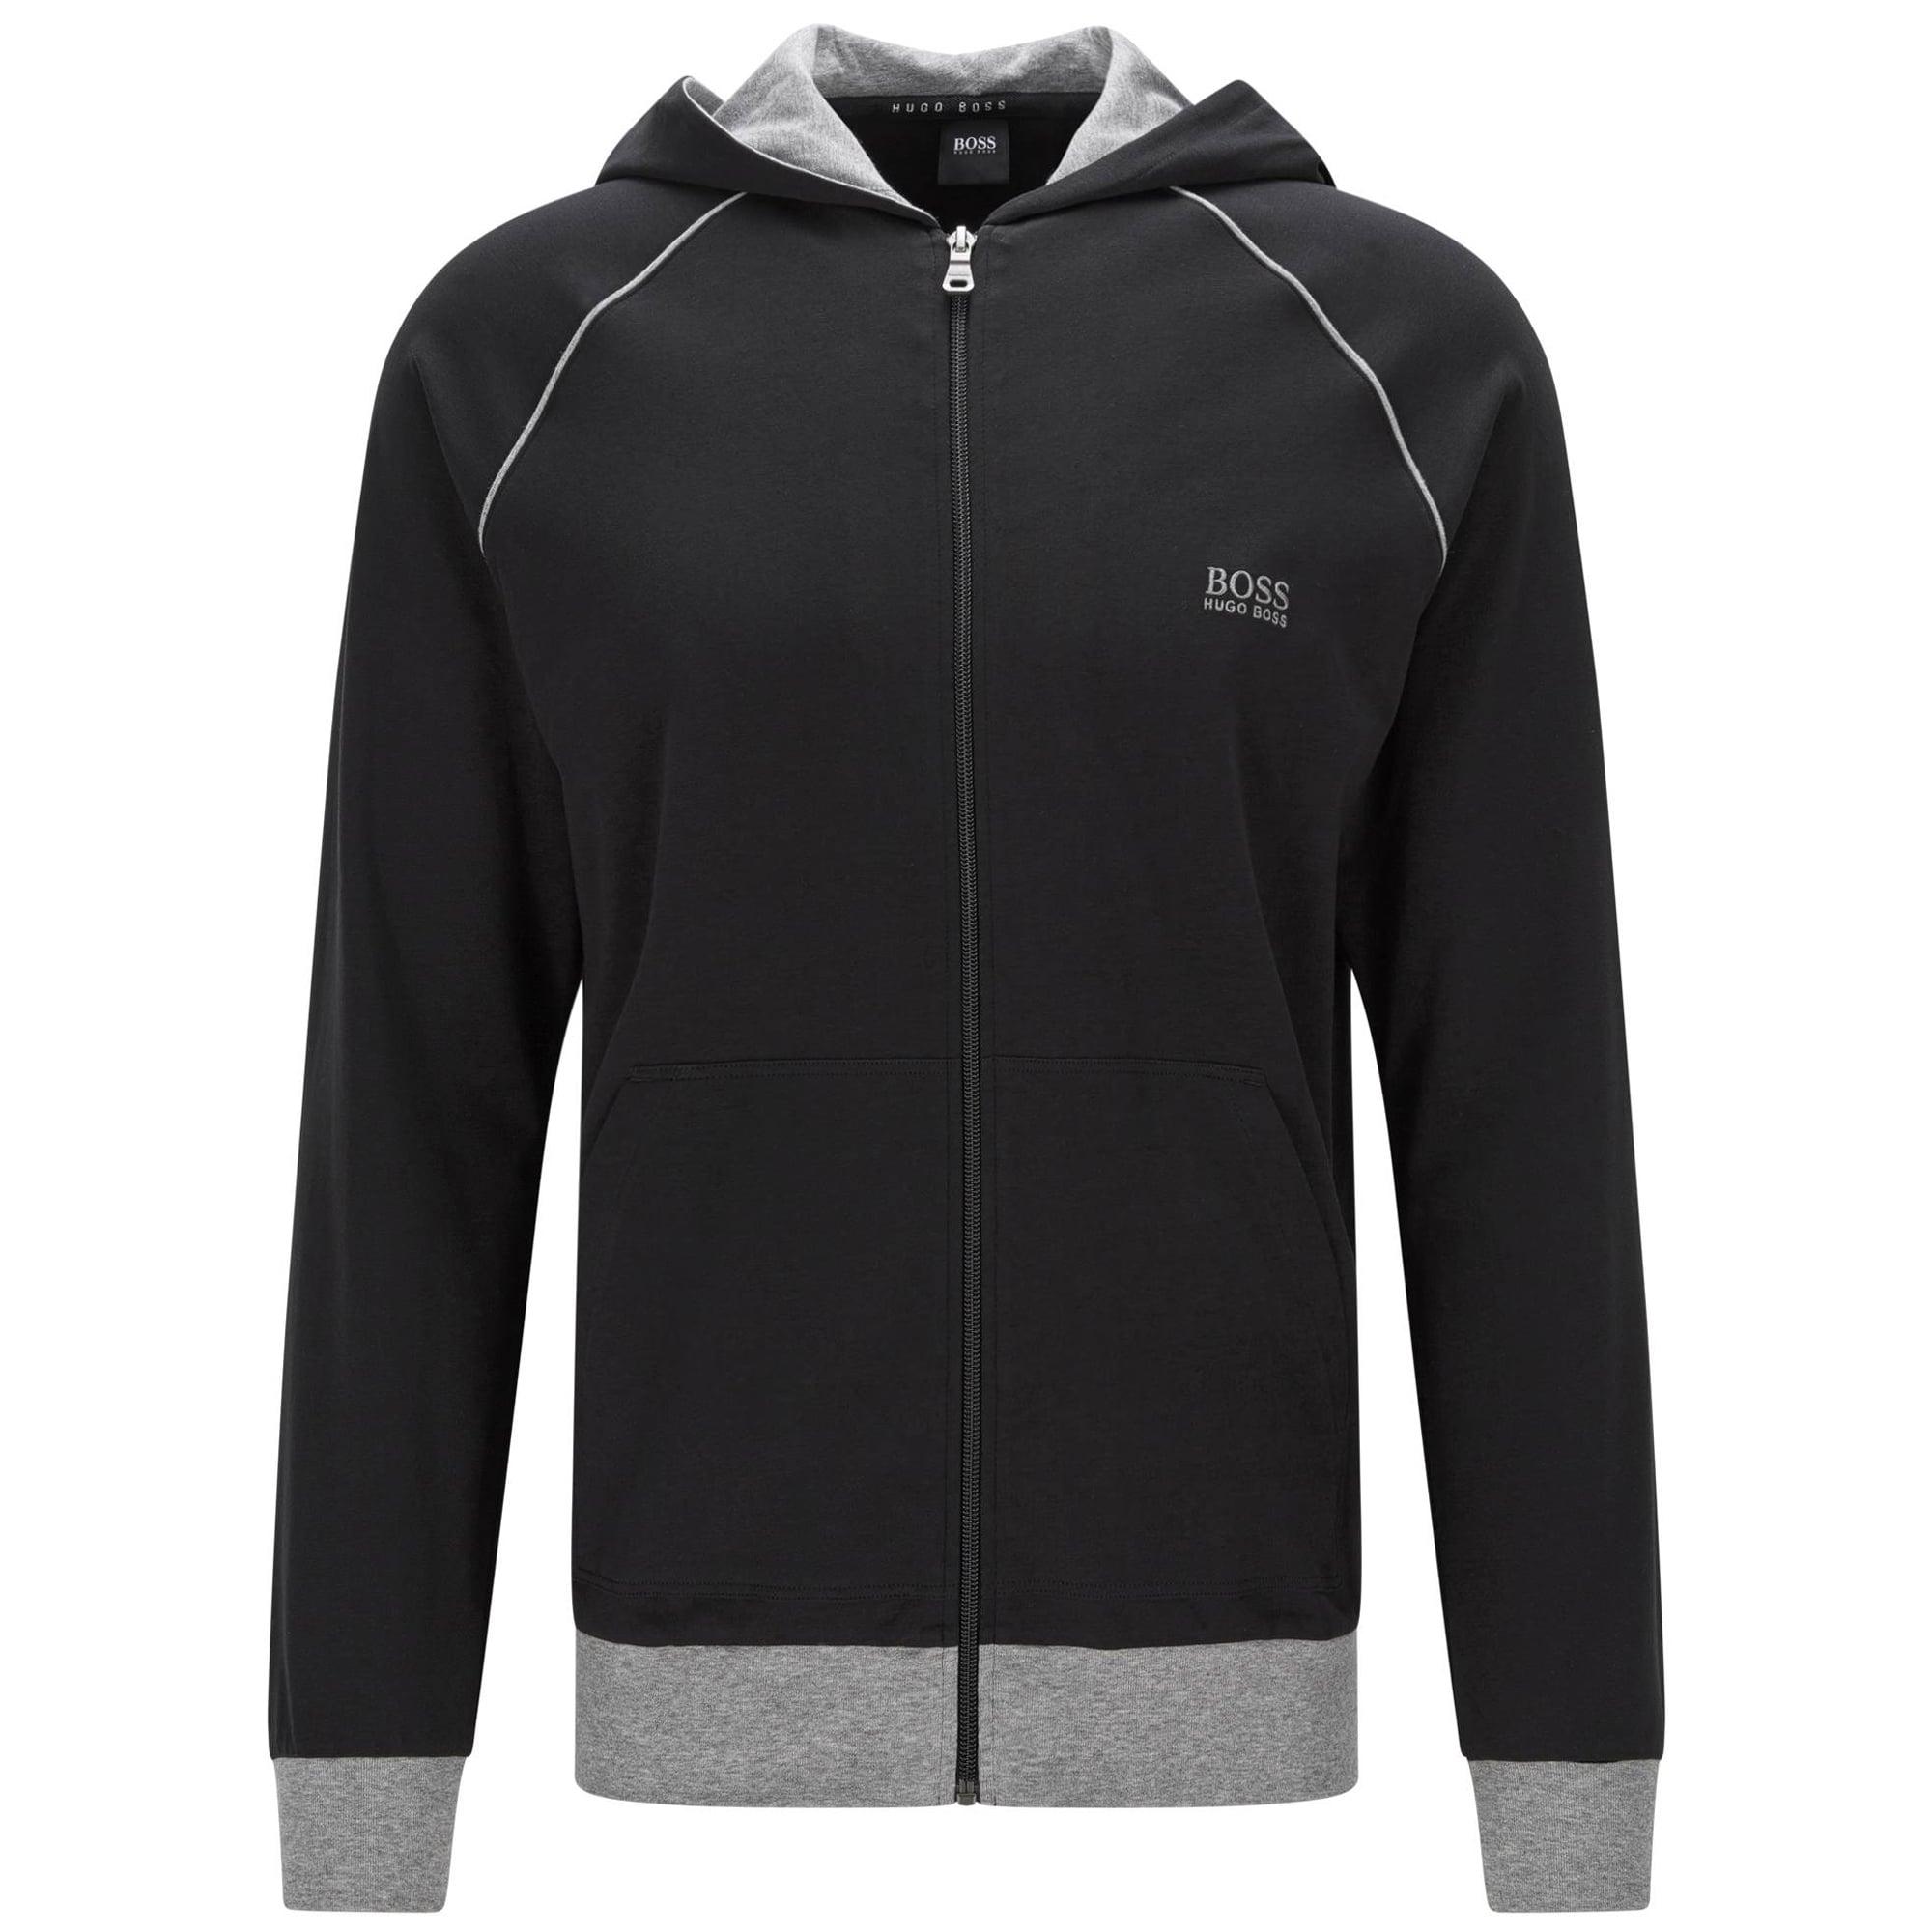 33edc0d3f Hugo Boss Jacket Hooded Black Track Top 50330947